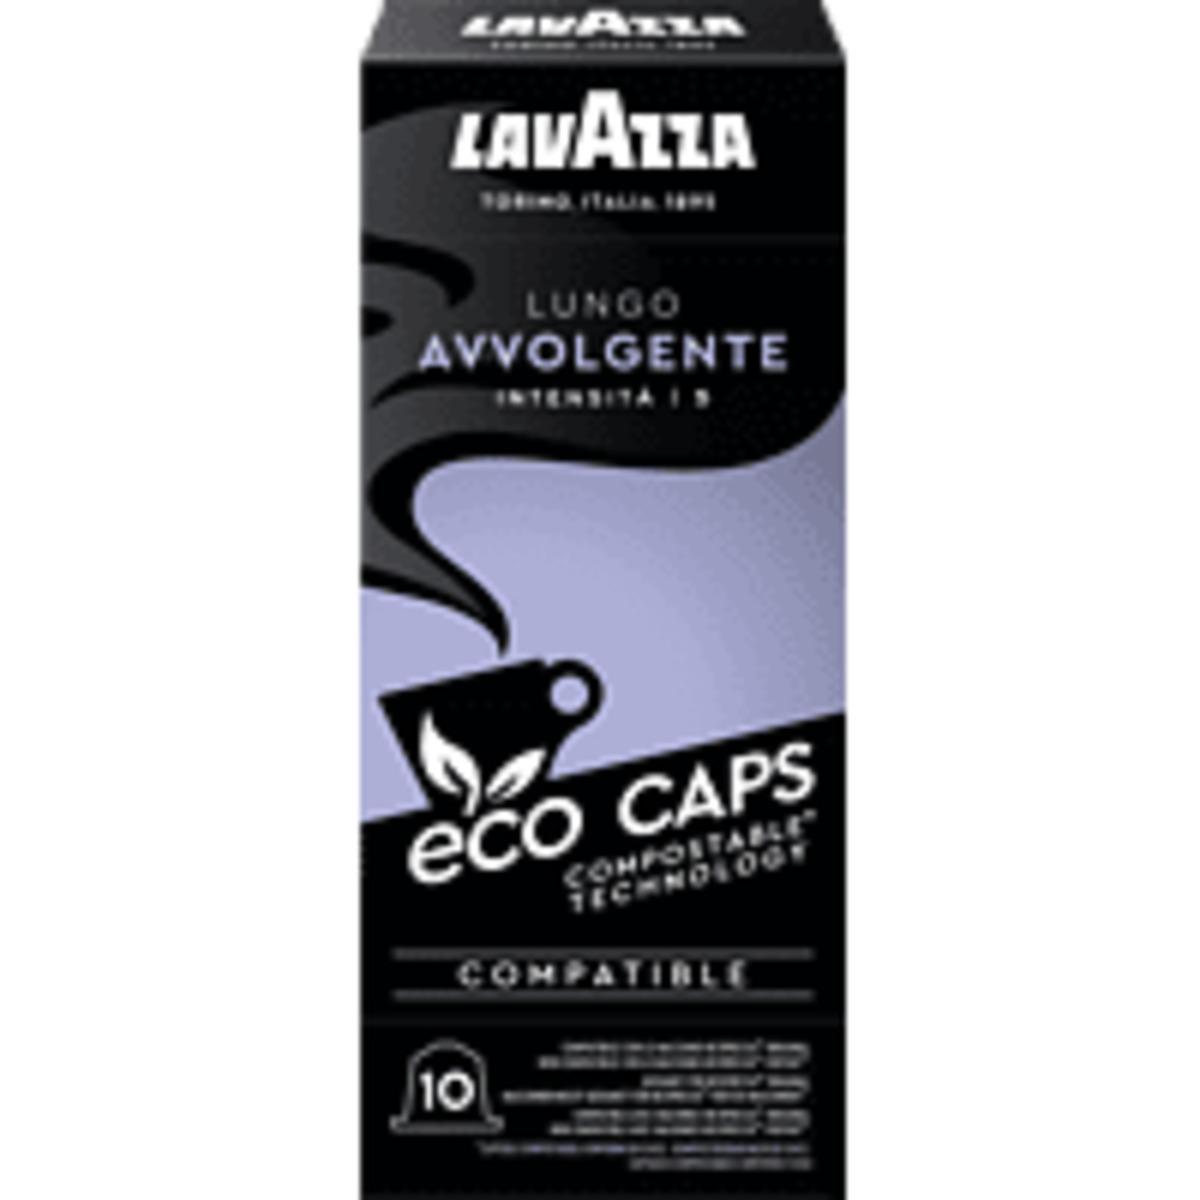 Bild 1 von LAVAZZA 8253 NCC ECO Lungo Avvolgente Kaffeekapseln